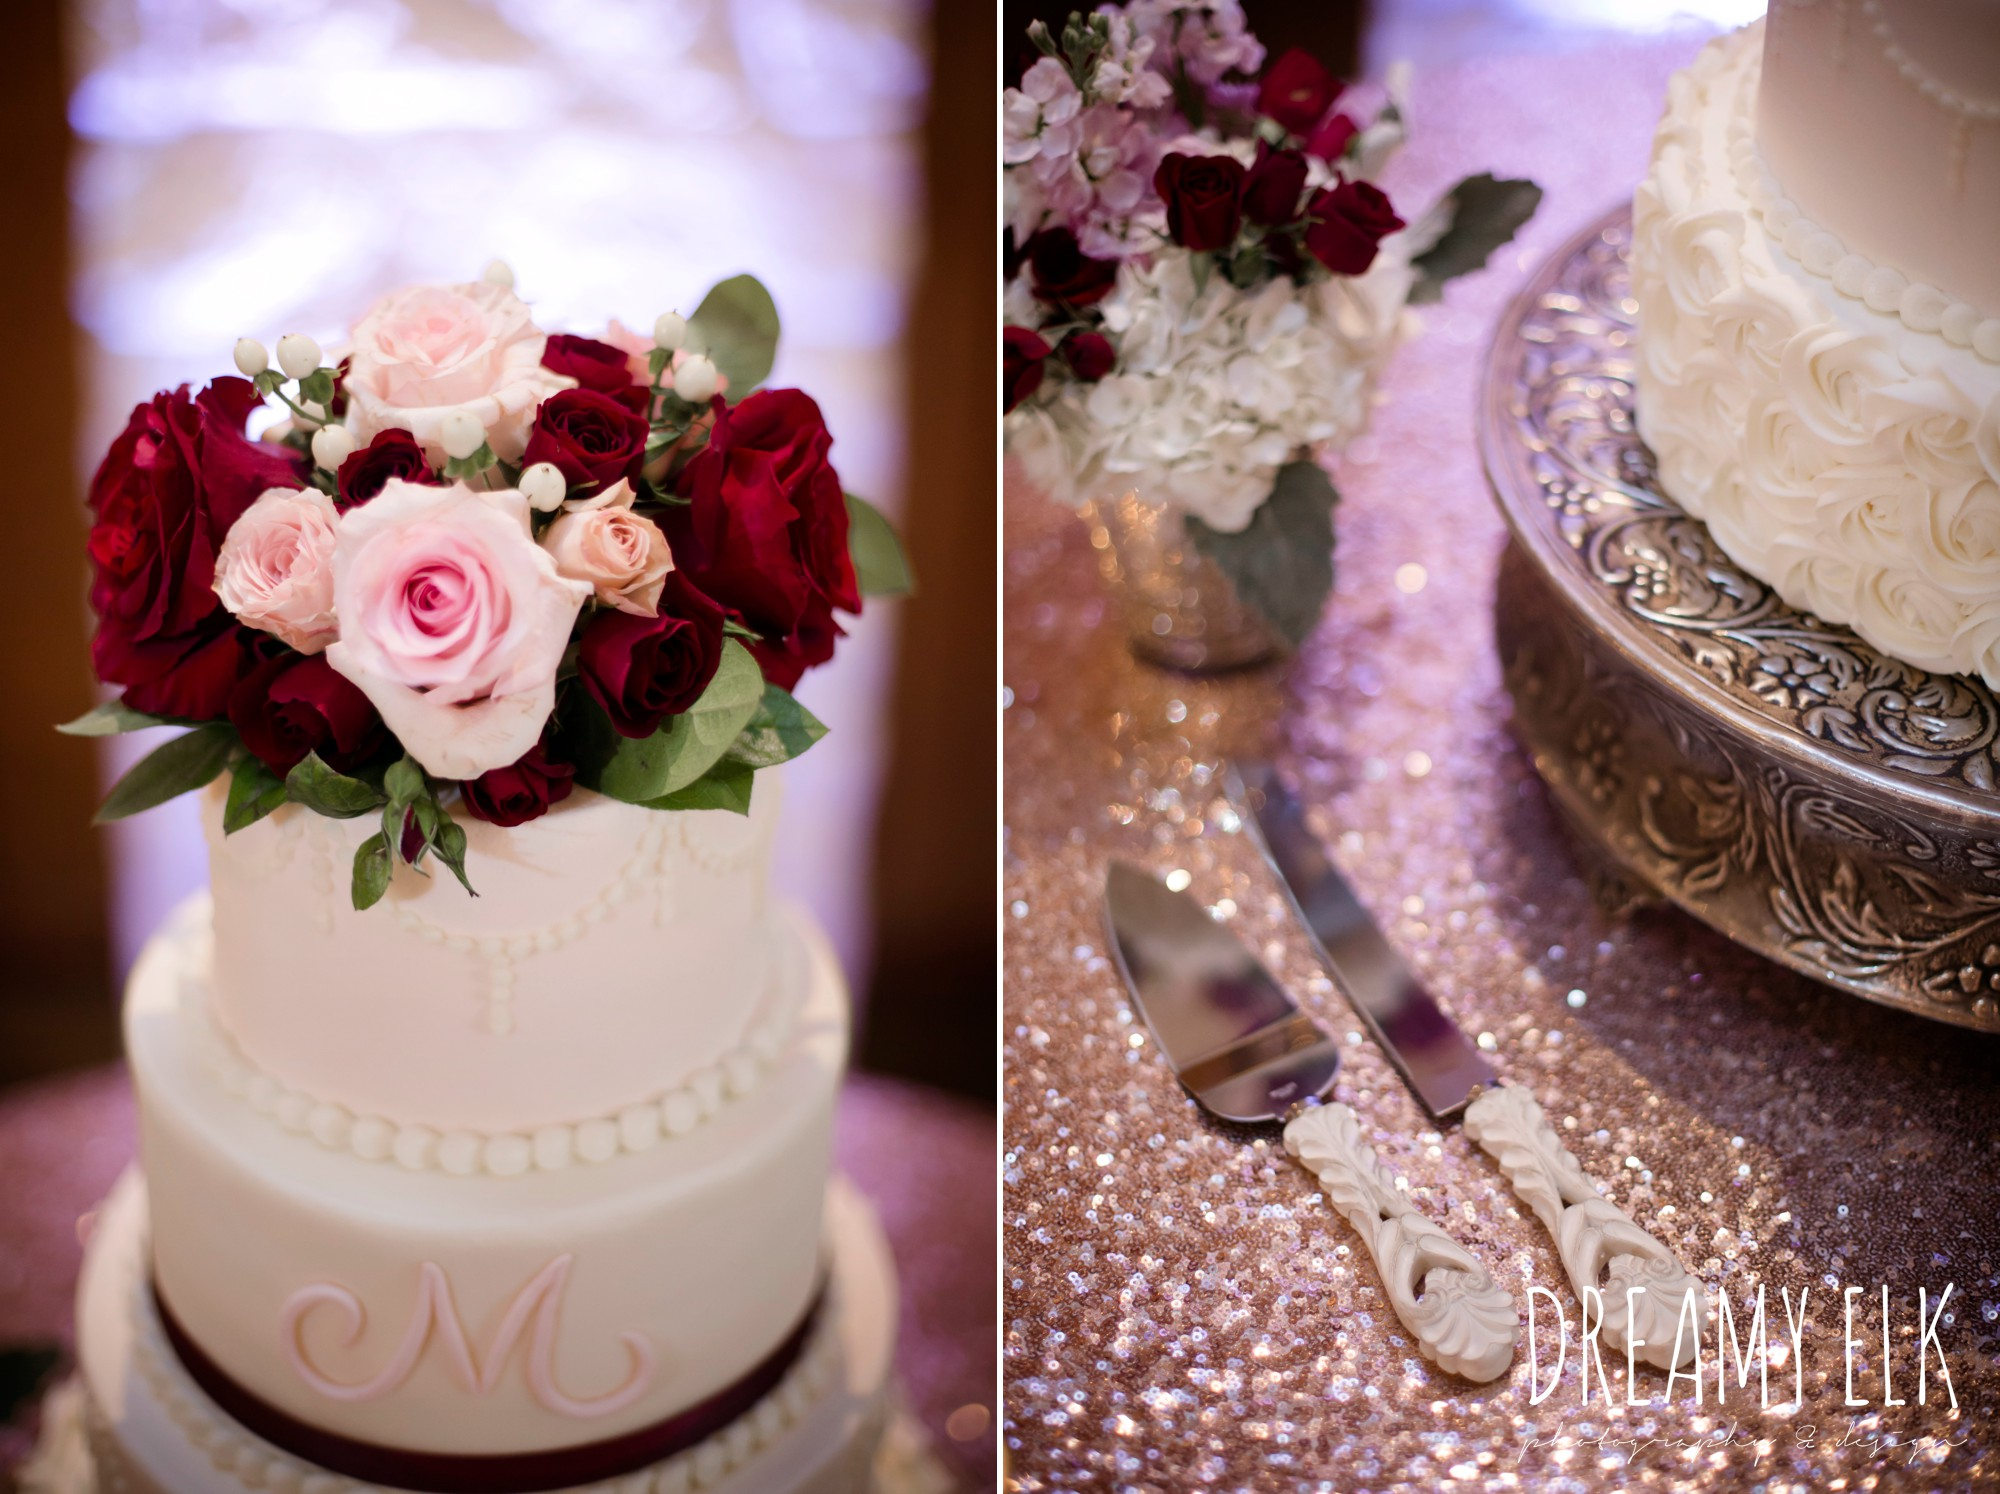 barcelona cakes, four tier white wedding cake, september wedding photo, ashelynn manor, magnolia, texas, austin texas wedding photographer {dreamy elk photography and design}